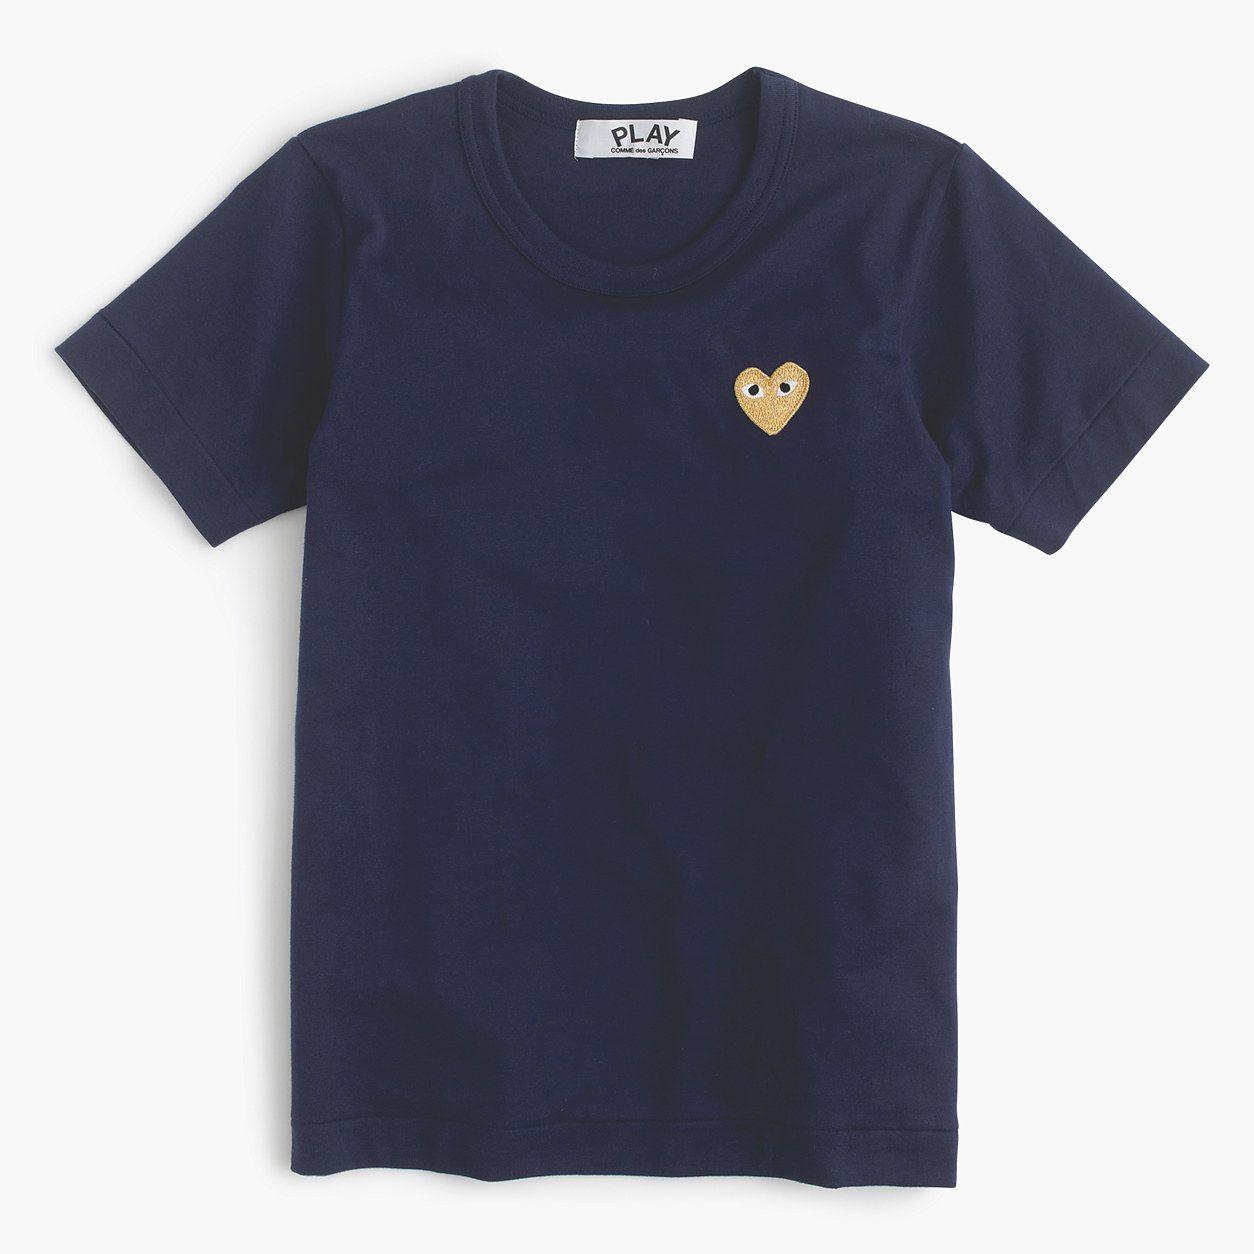 J.Crew Womens Play Comme Des Garcons Gold Heart T-Shirt (Size S)